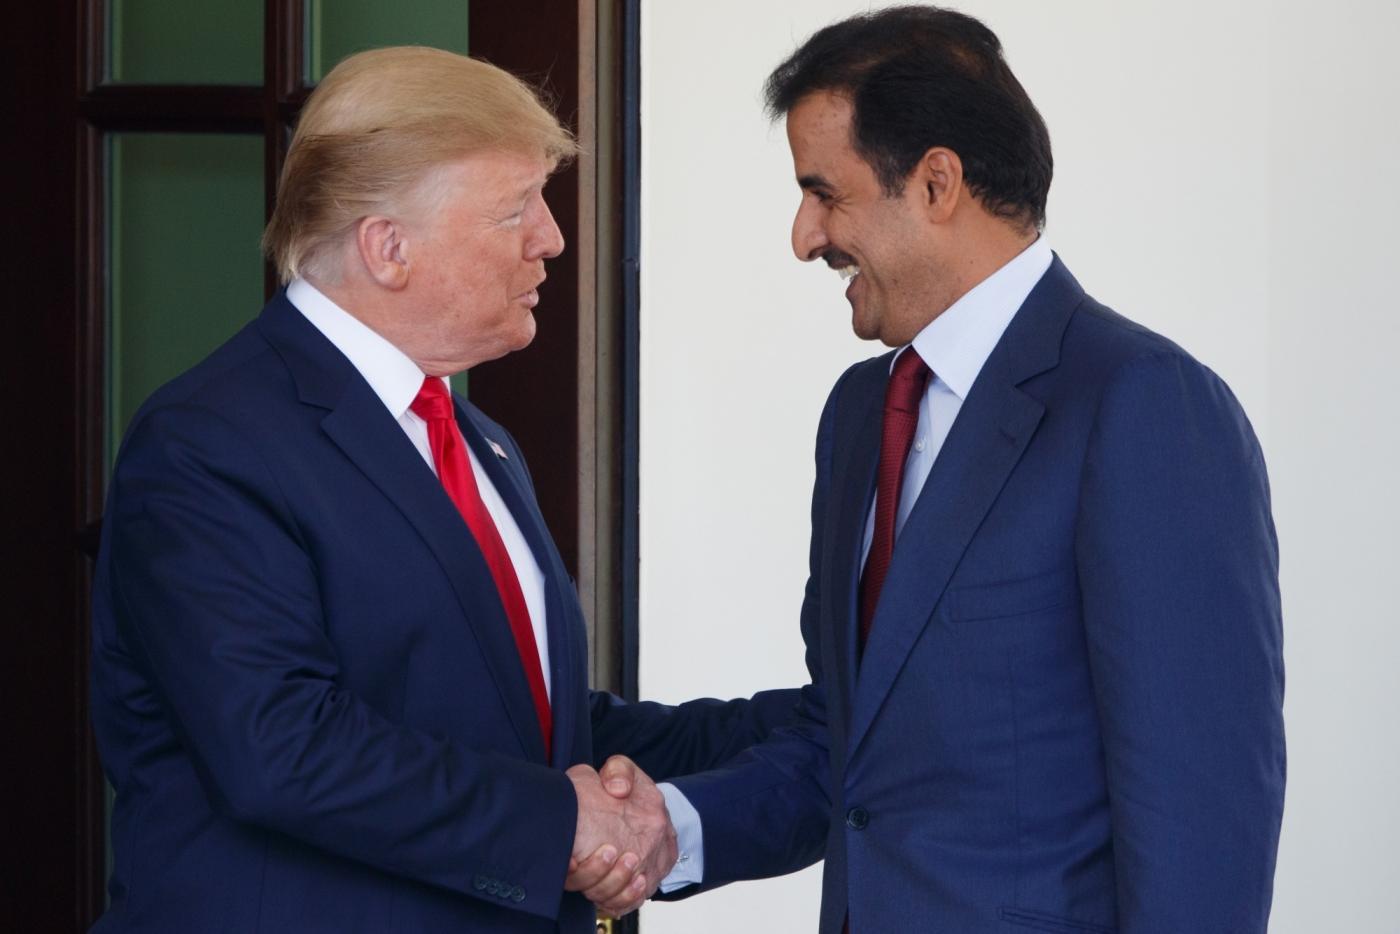 Washington, July 10, 2019 (Xinhua) -- U.S. President Donald Trump (L) welcomes Qatari Emir Sheikh Tamim Bin Hamad Al-Thani at the White House in Washington D.C., the United States, on July 9, 2019. (Xinhua/Ting Shen/IANS) by .